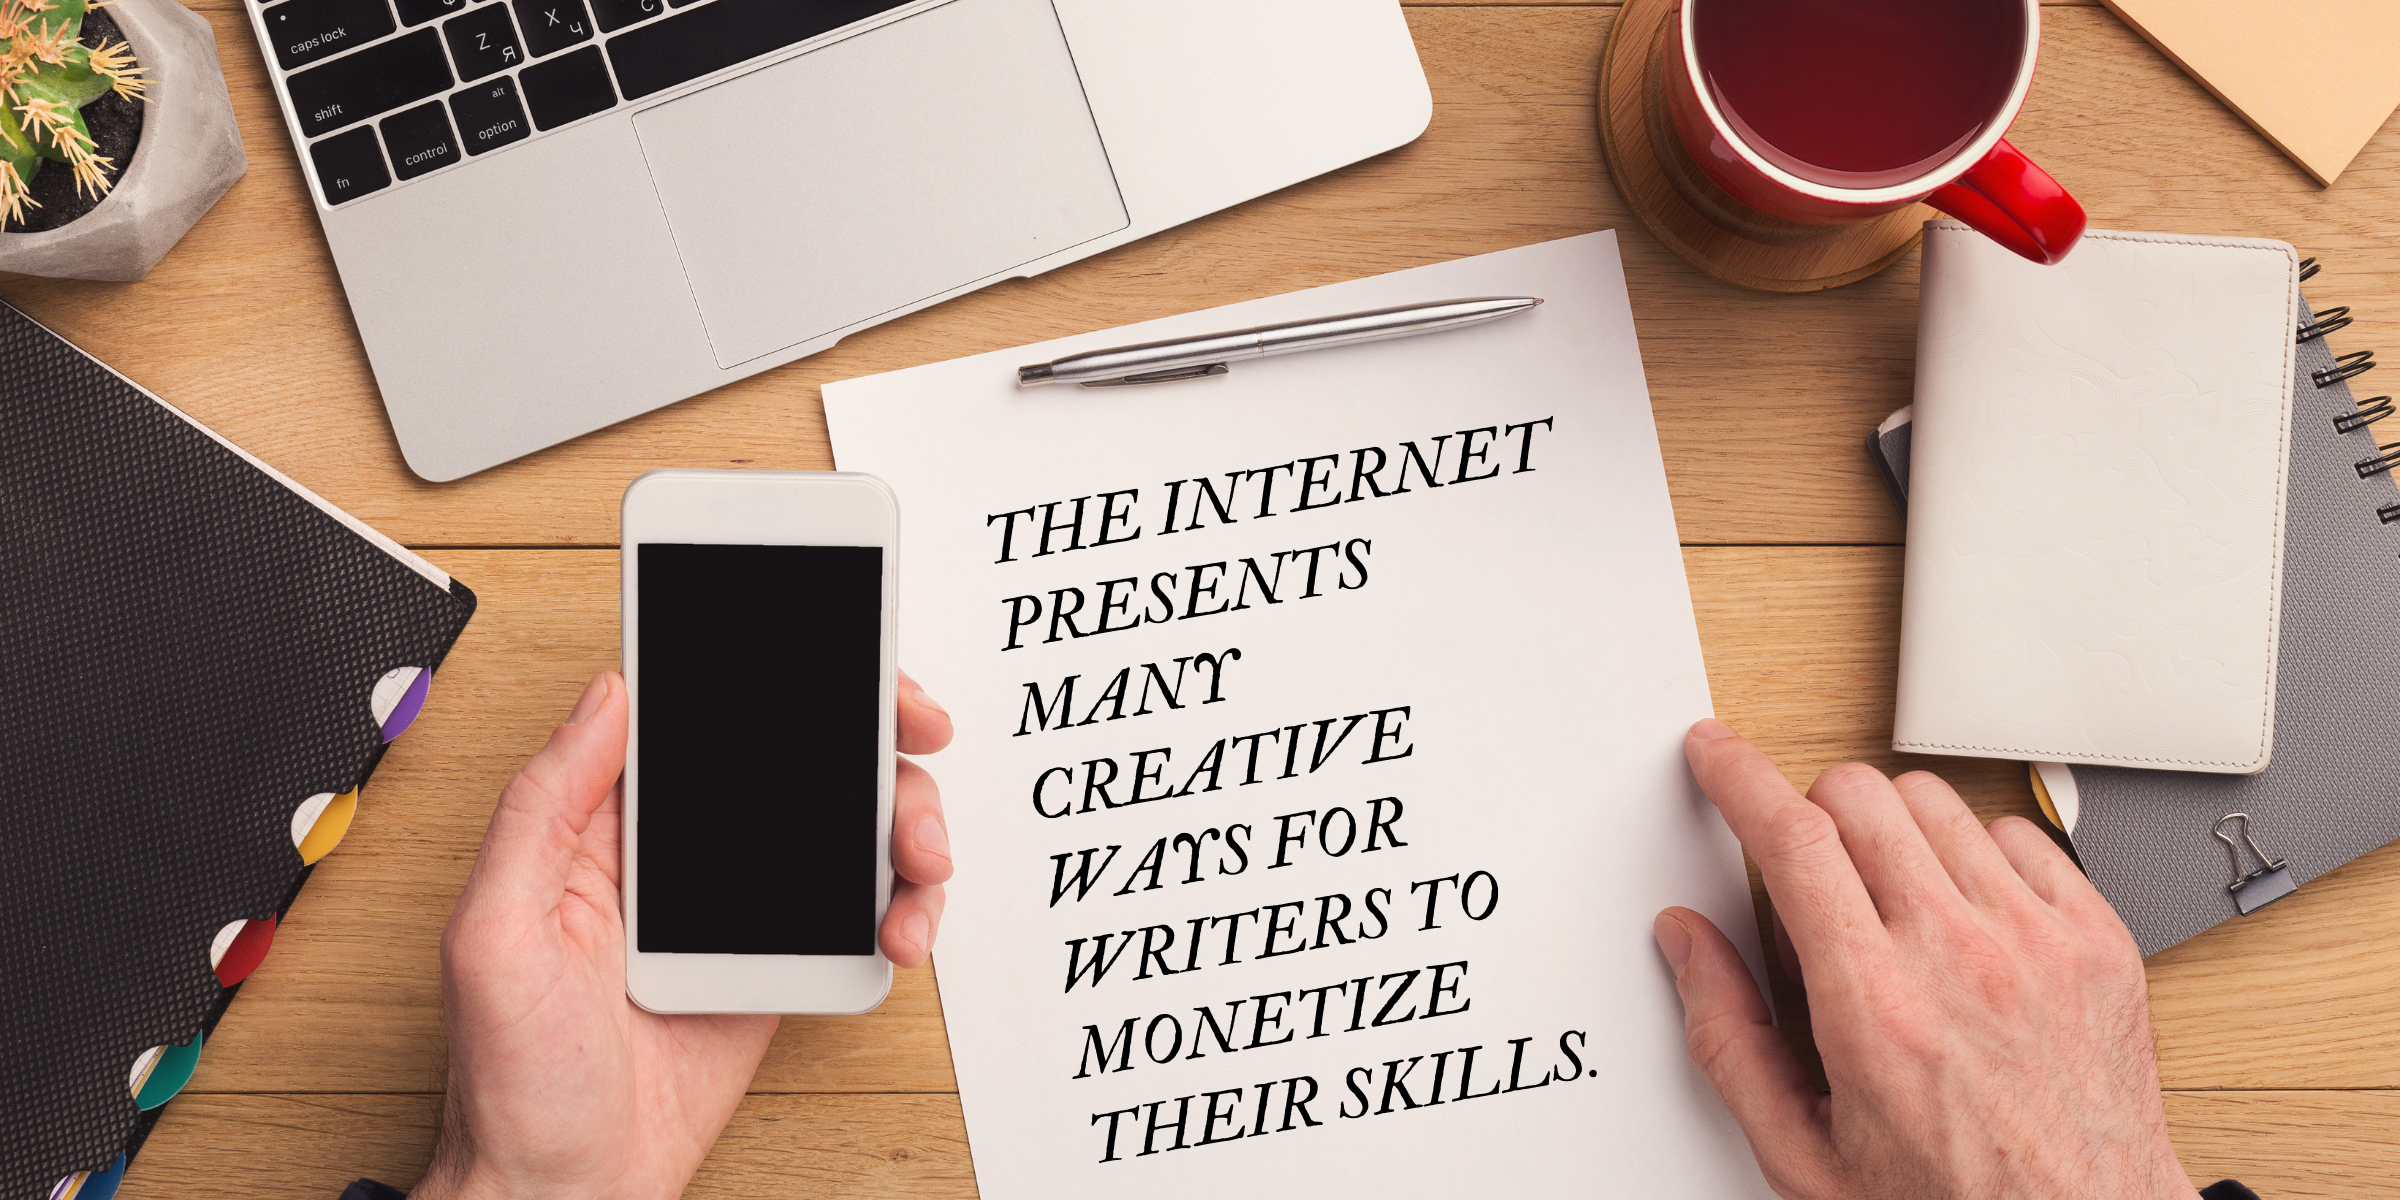 creativewriting4